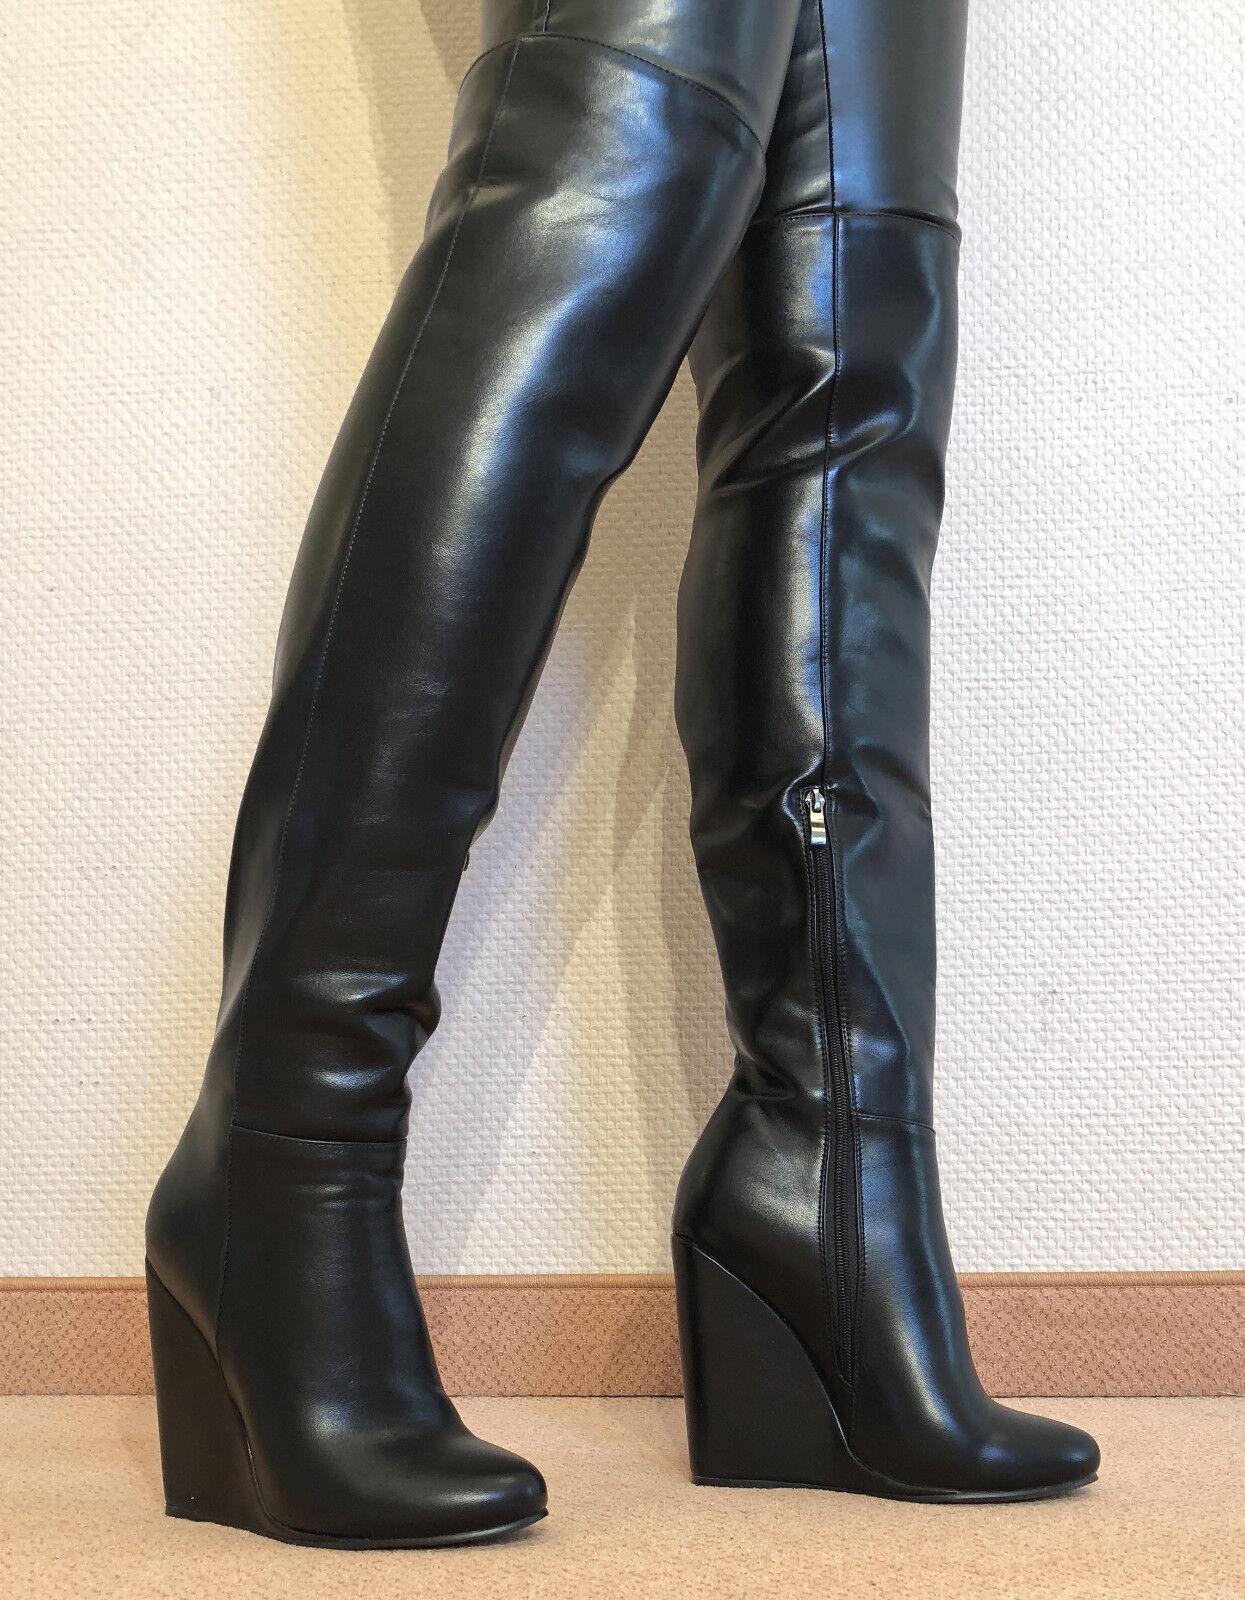 Gr.44 TOP ! Exklusiv Sexy Damen Schuhe Overknee Stiletto Stiefel Männer Boots D1